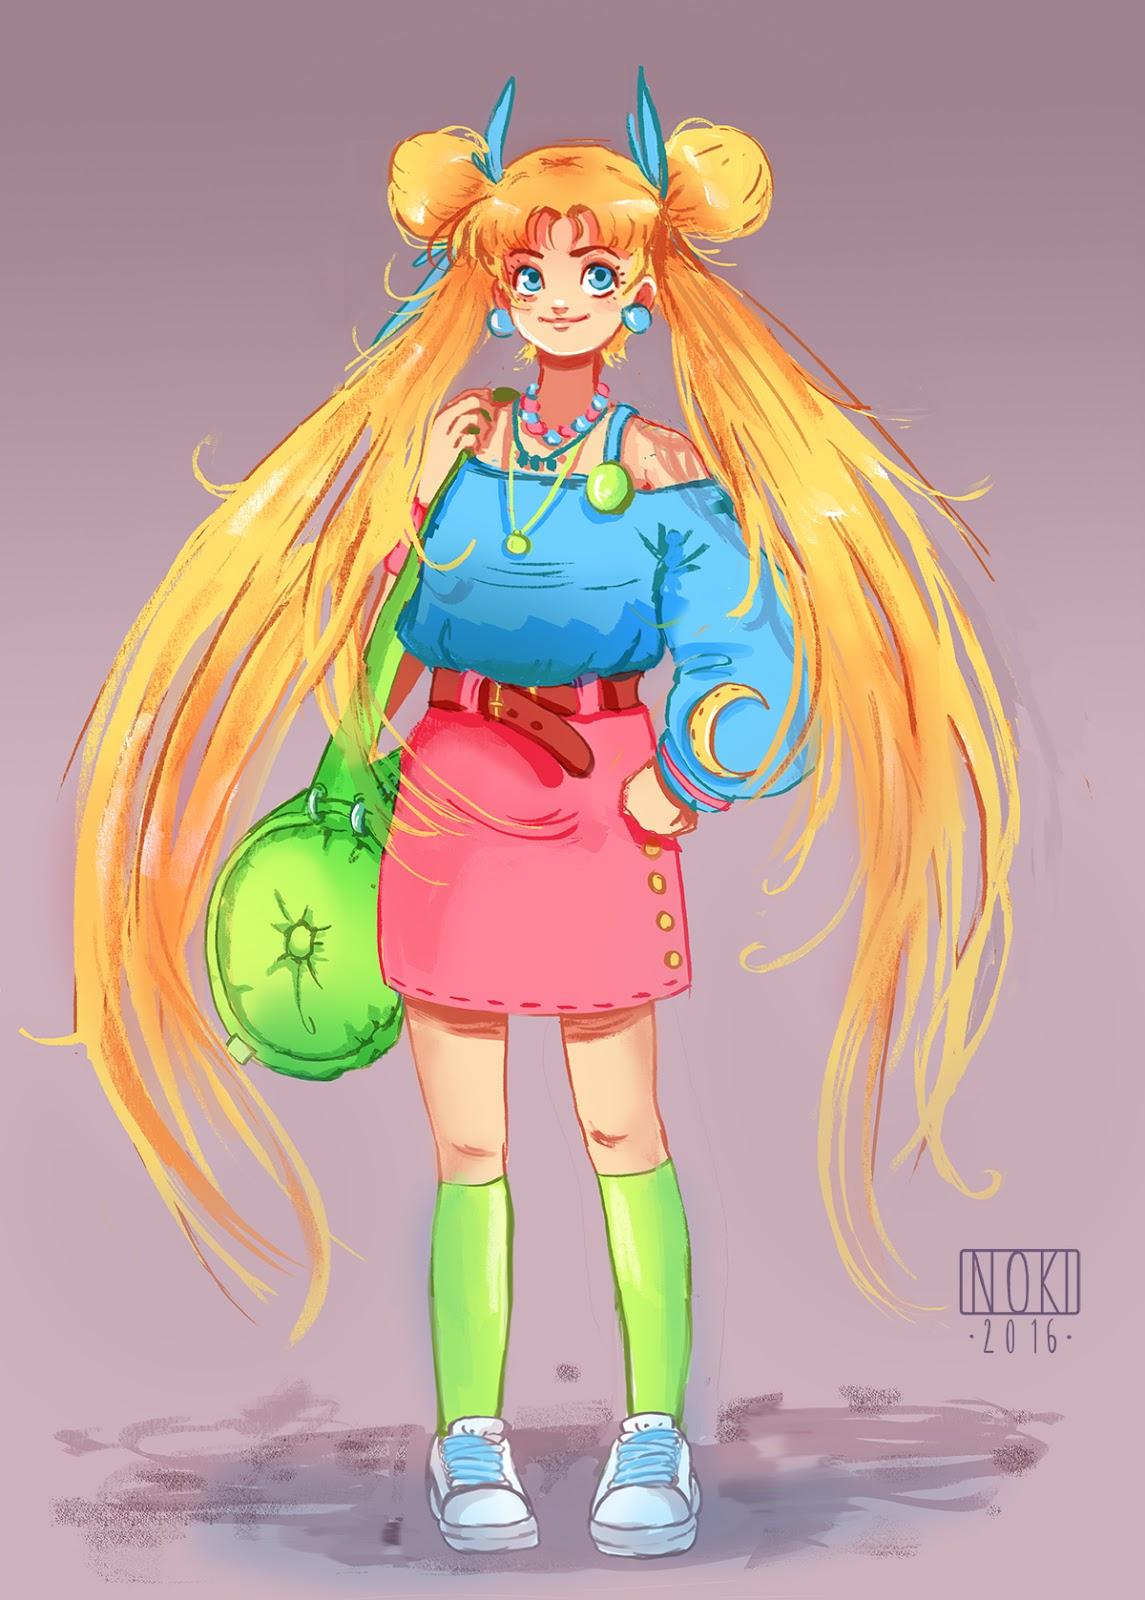 Character Design Challenge Sailor Moon : Sophie hei character design challenge sailor moon